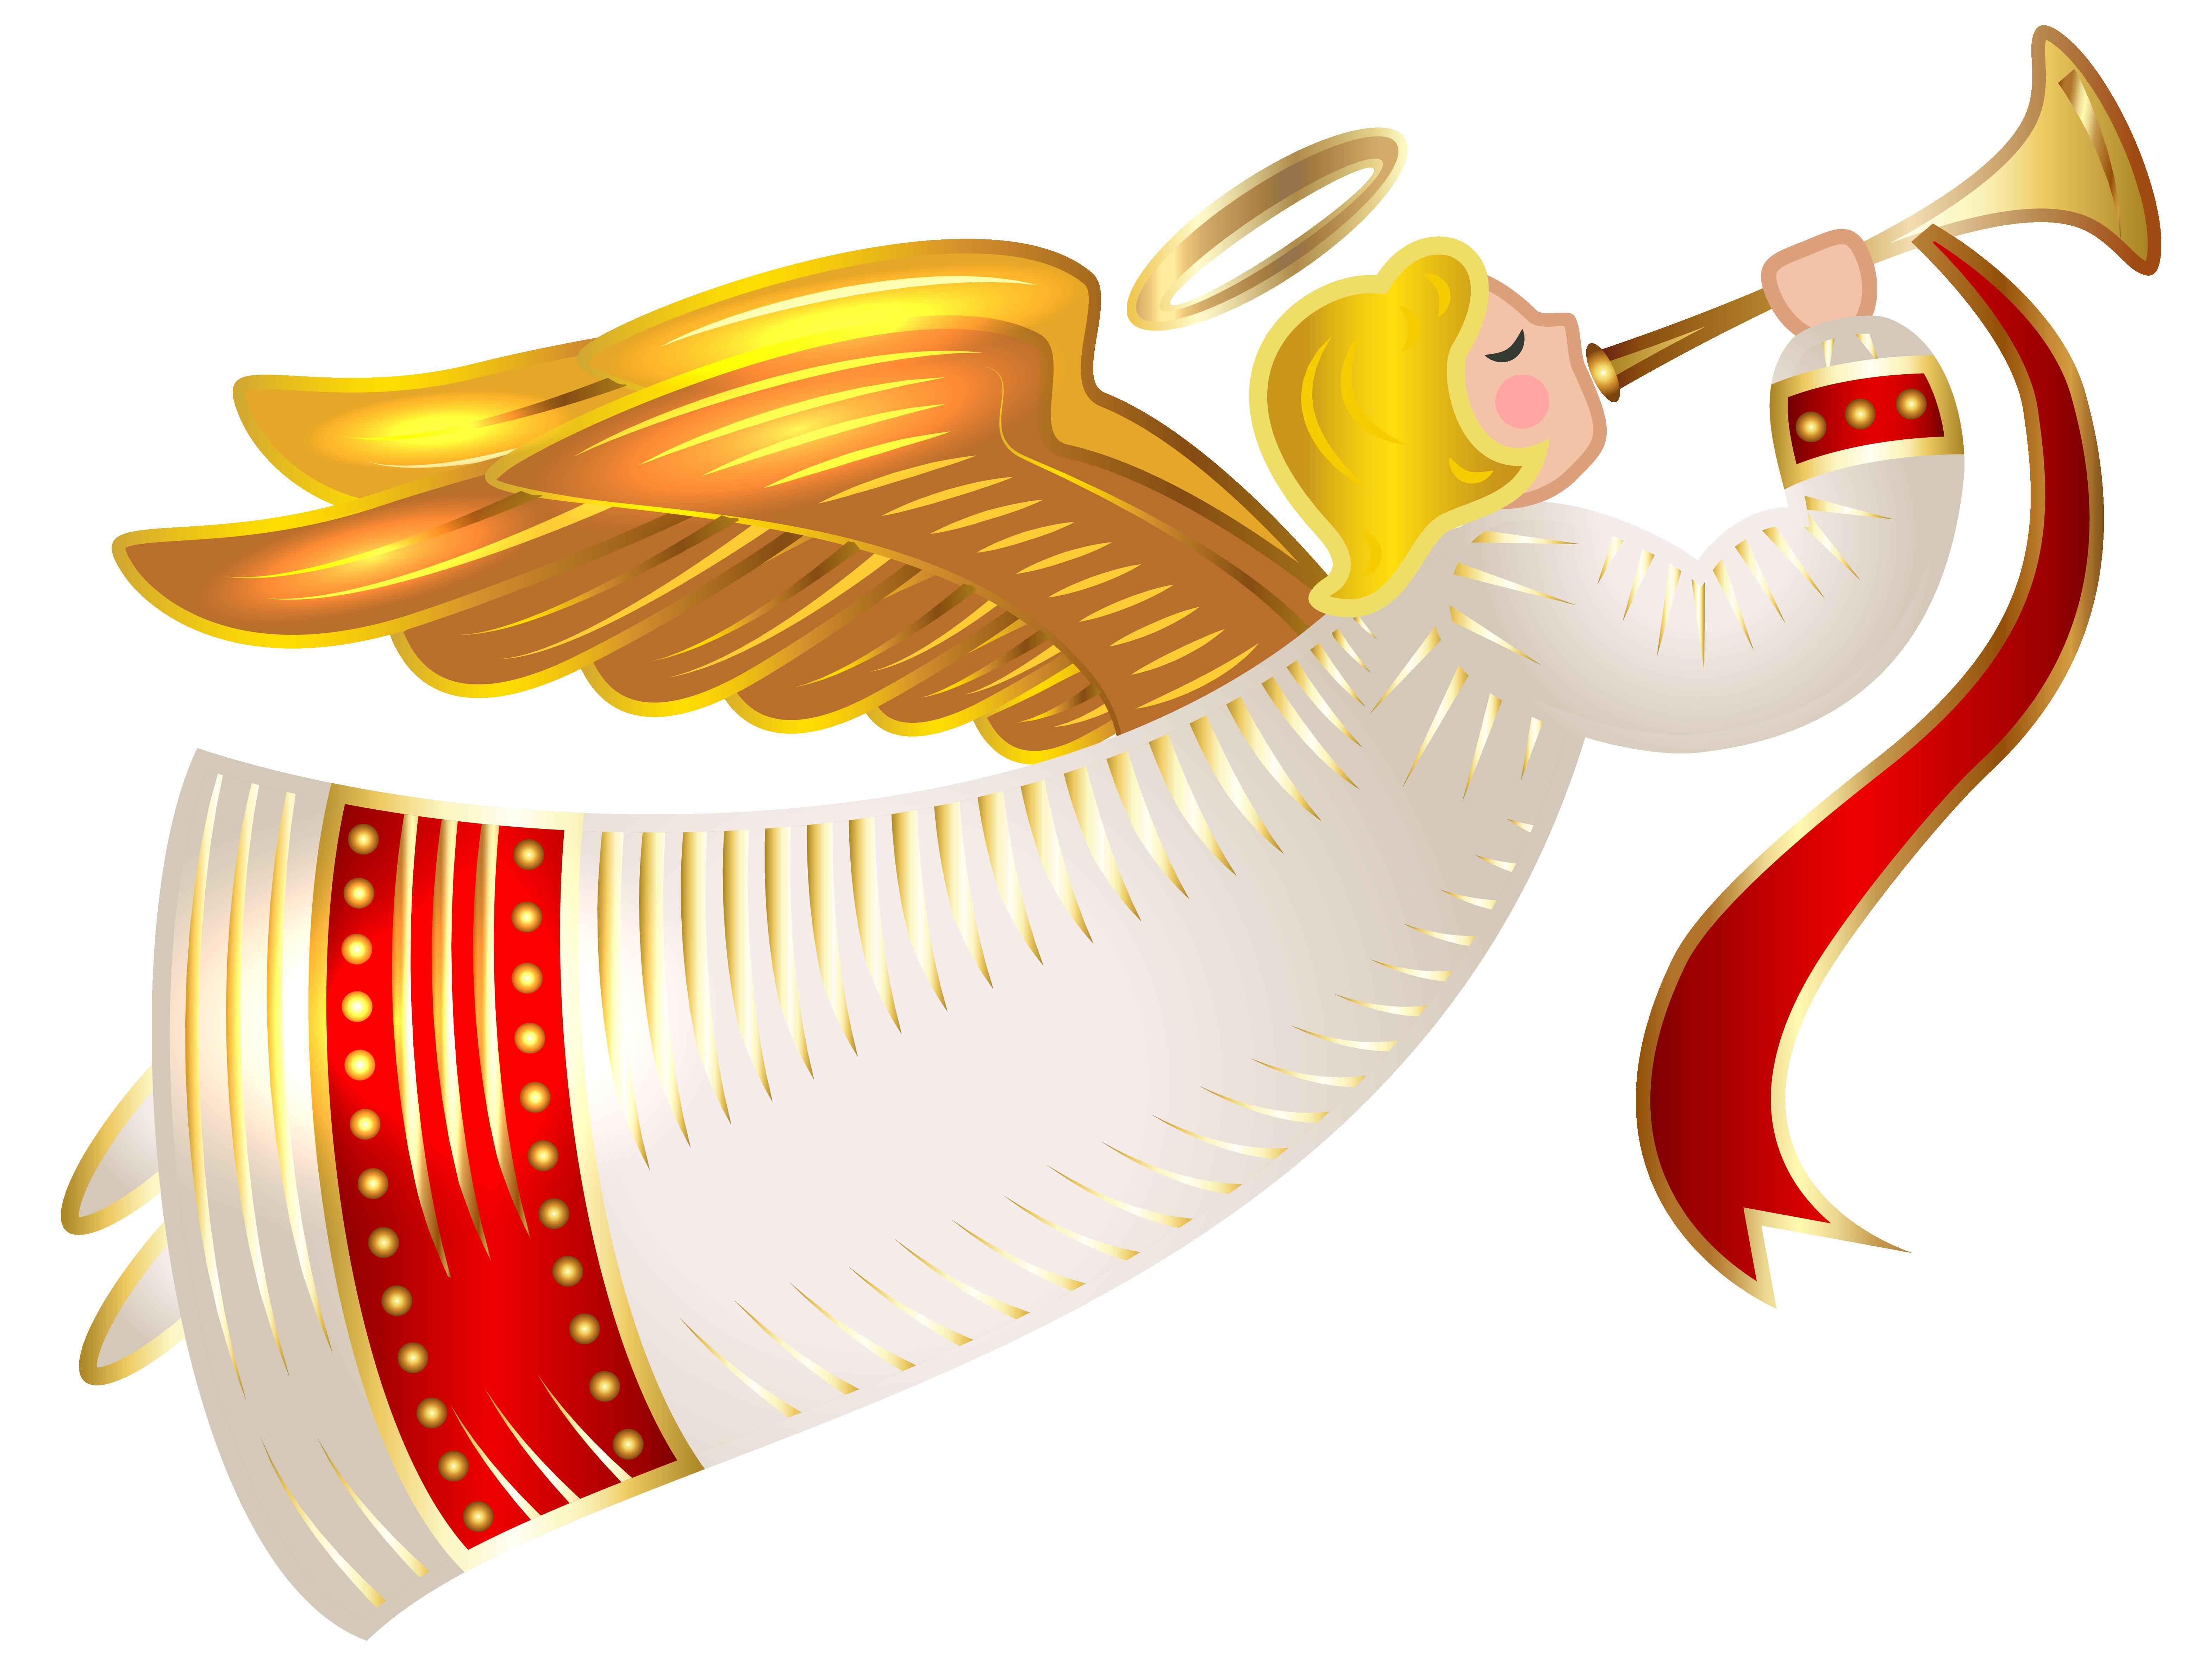 6282x4732 Christmas Angel Transparent Png Clip Art Imageu200b Gallery